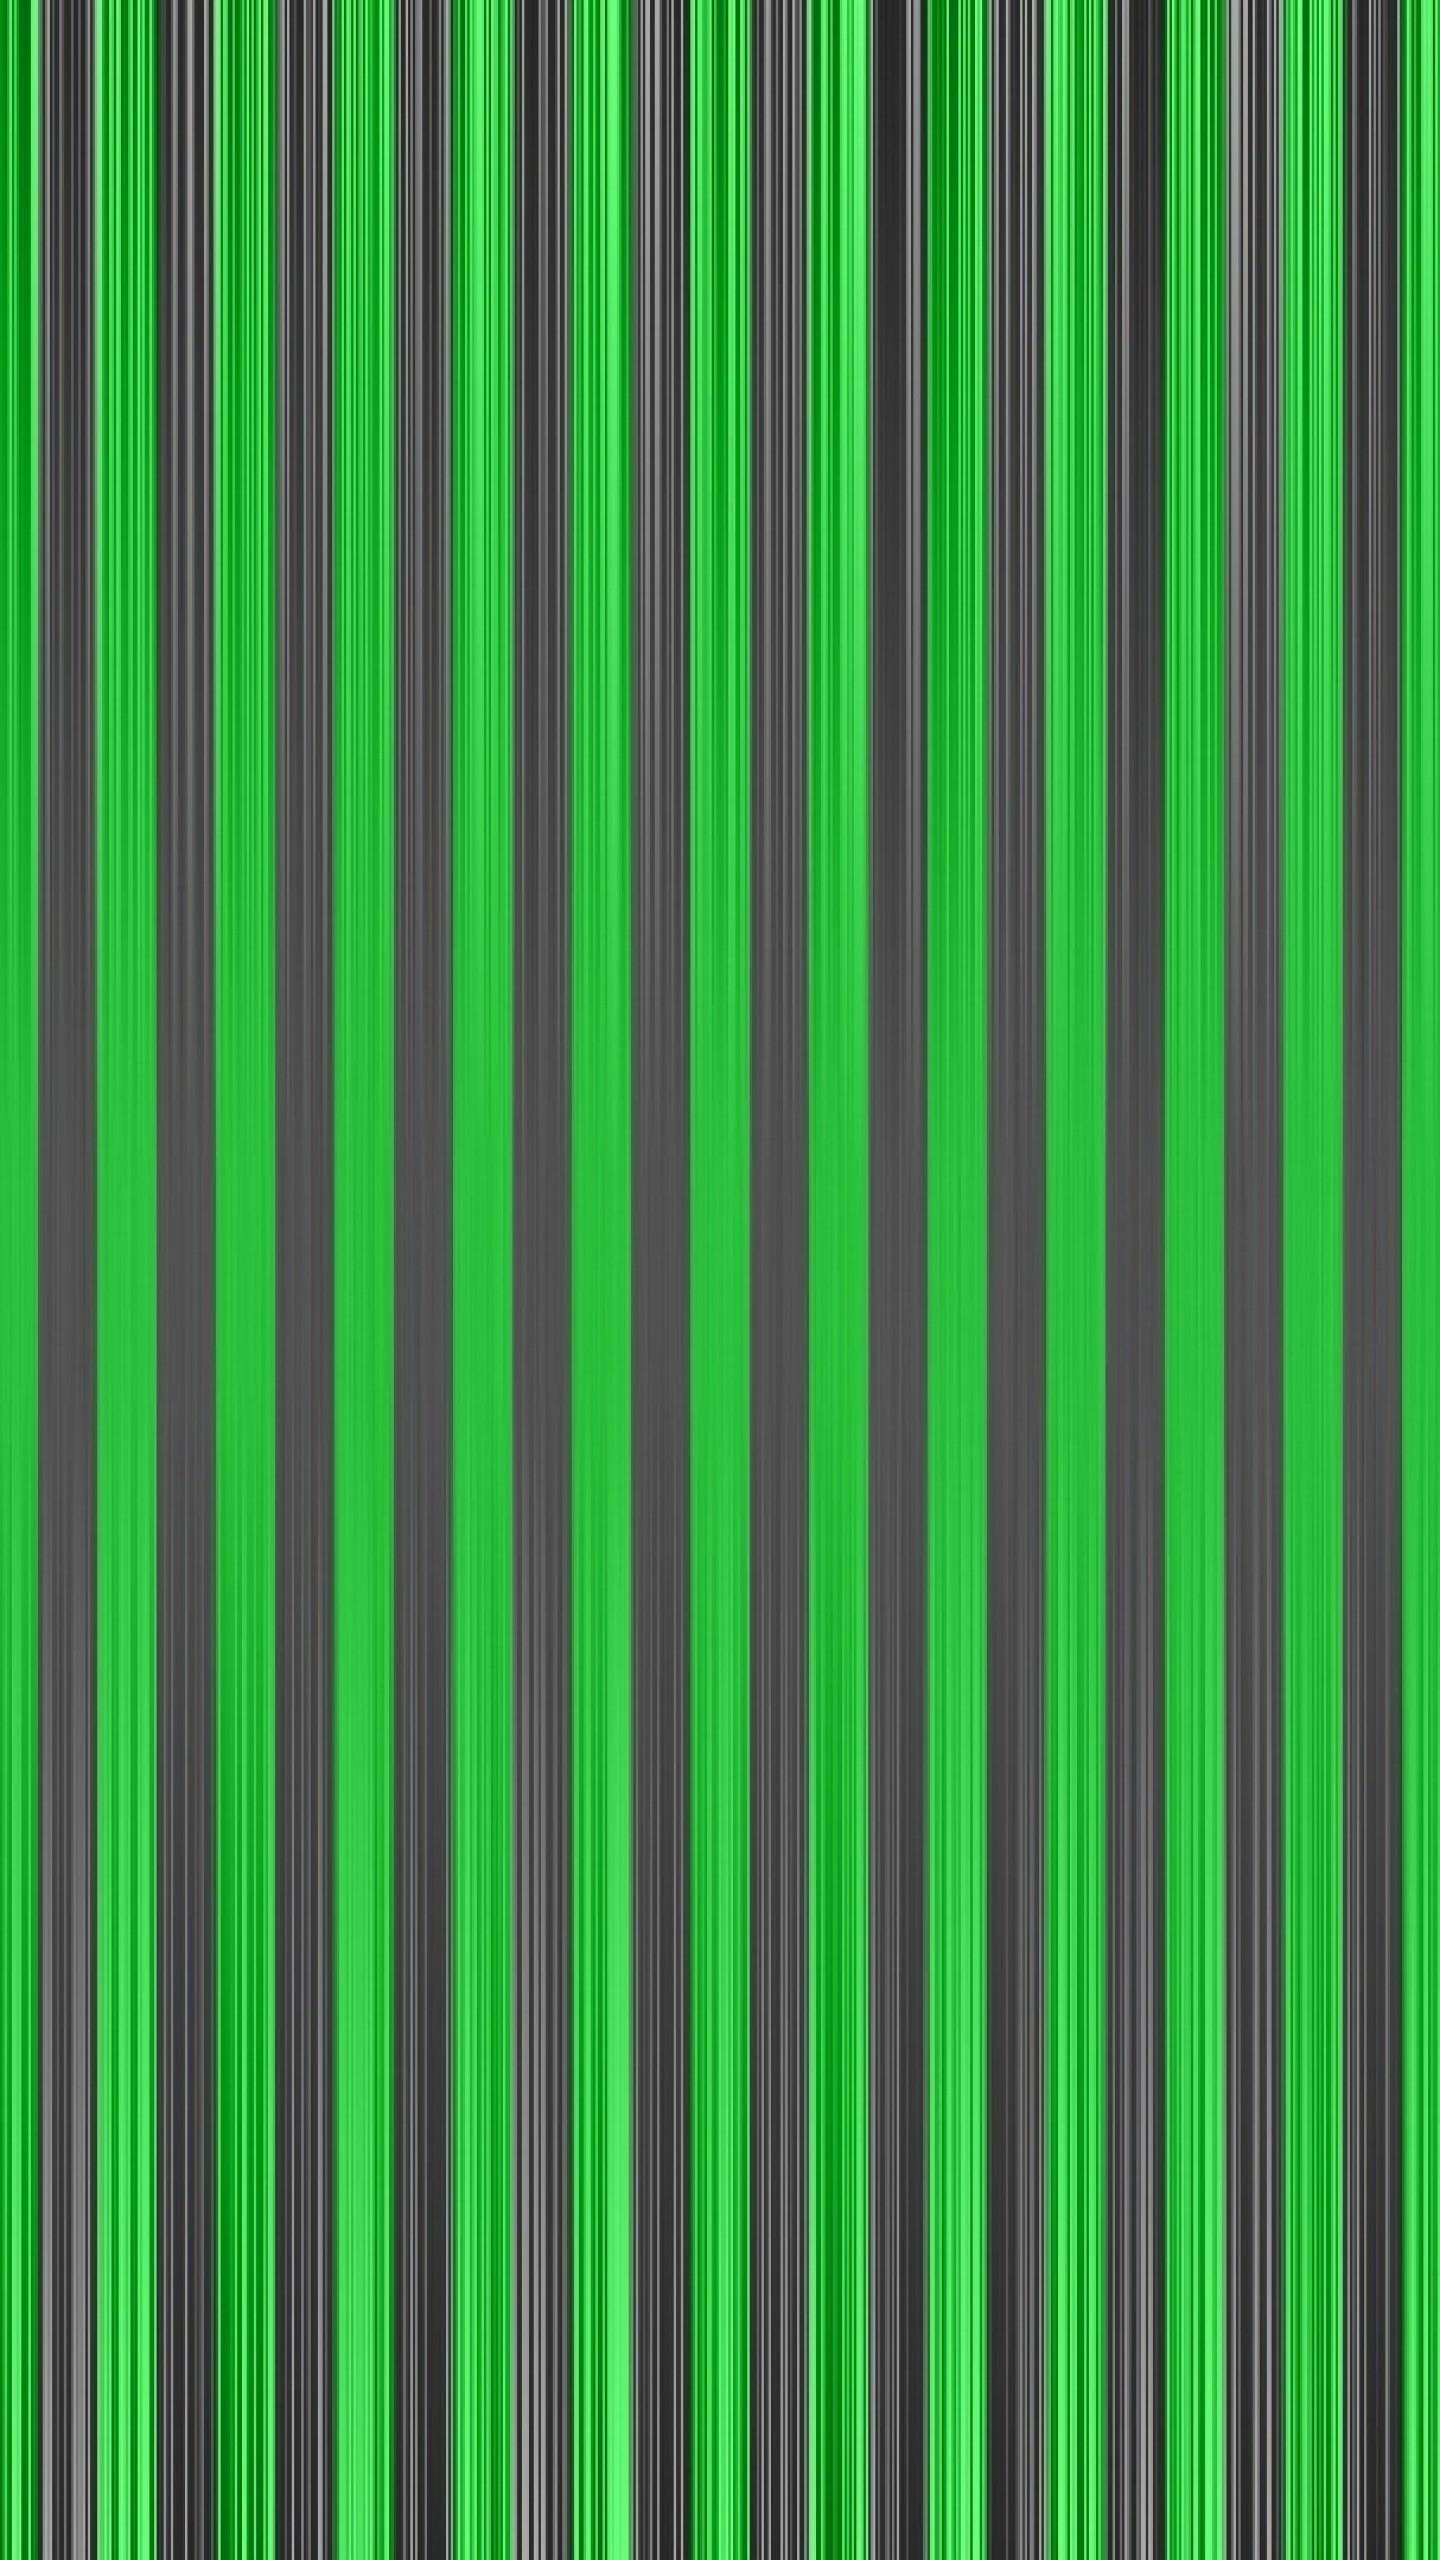 Wallpaper lines, stripes, vertical, green